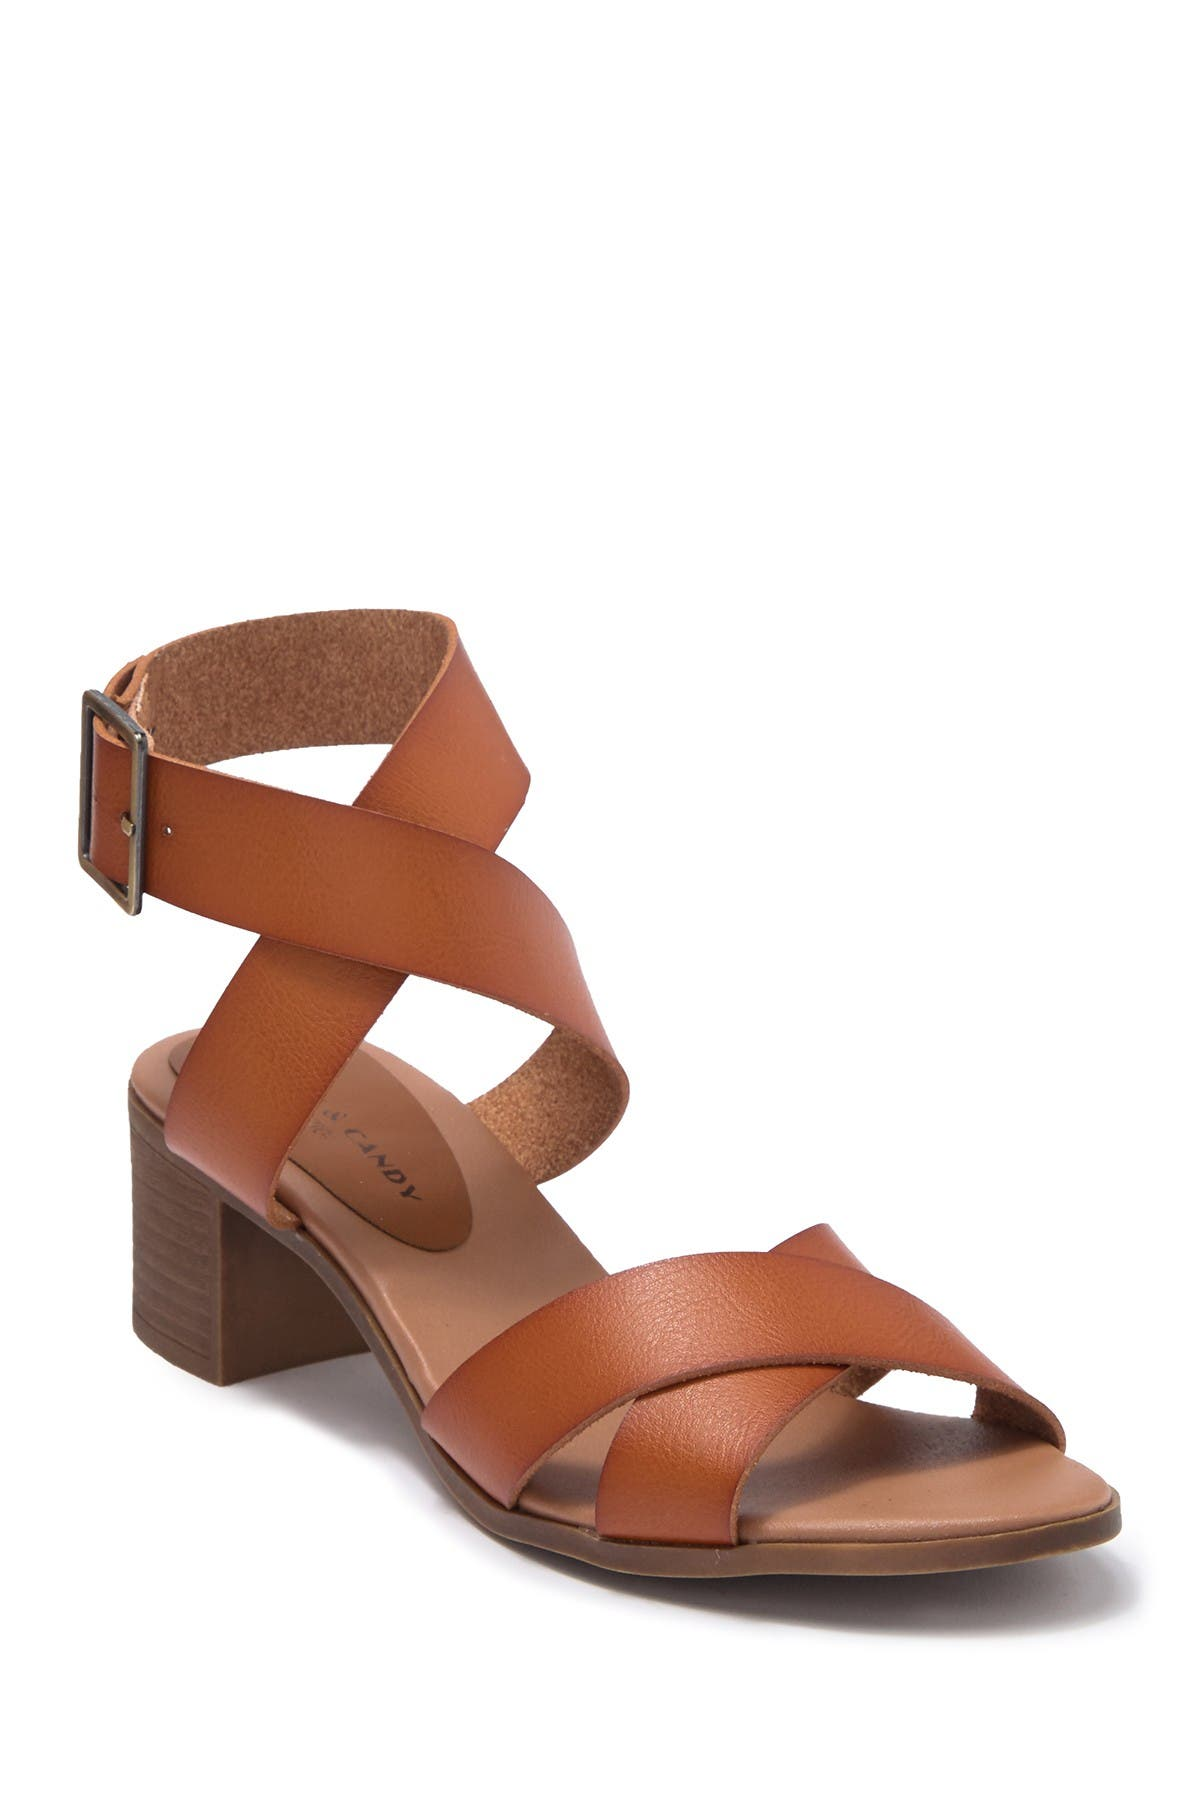 Image of Rock & Candy Nicci Block Heel Sandal